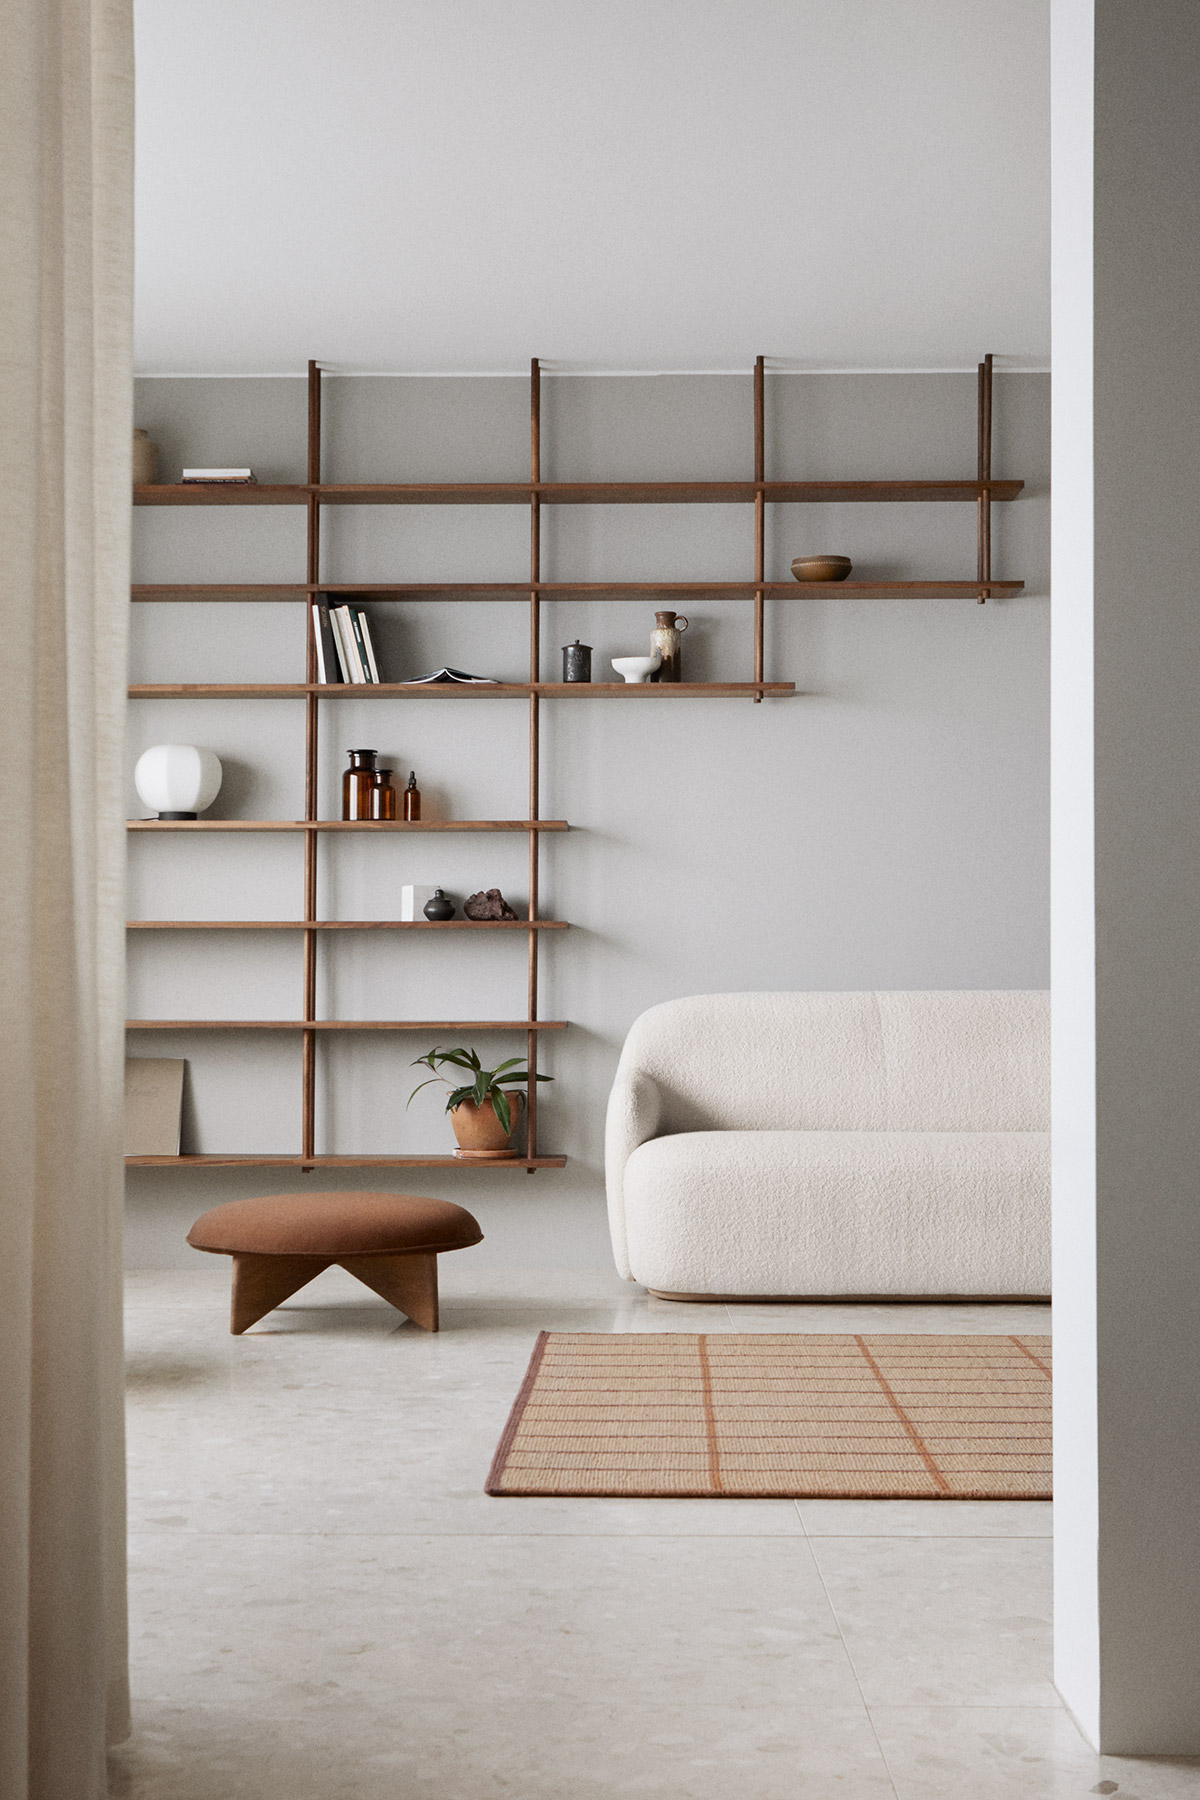 Japanese minimal white living room with white sofa and dark wood shelving